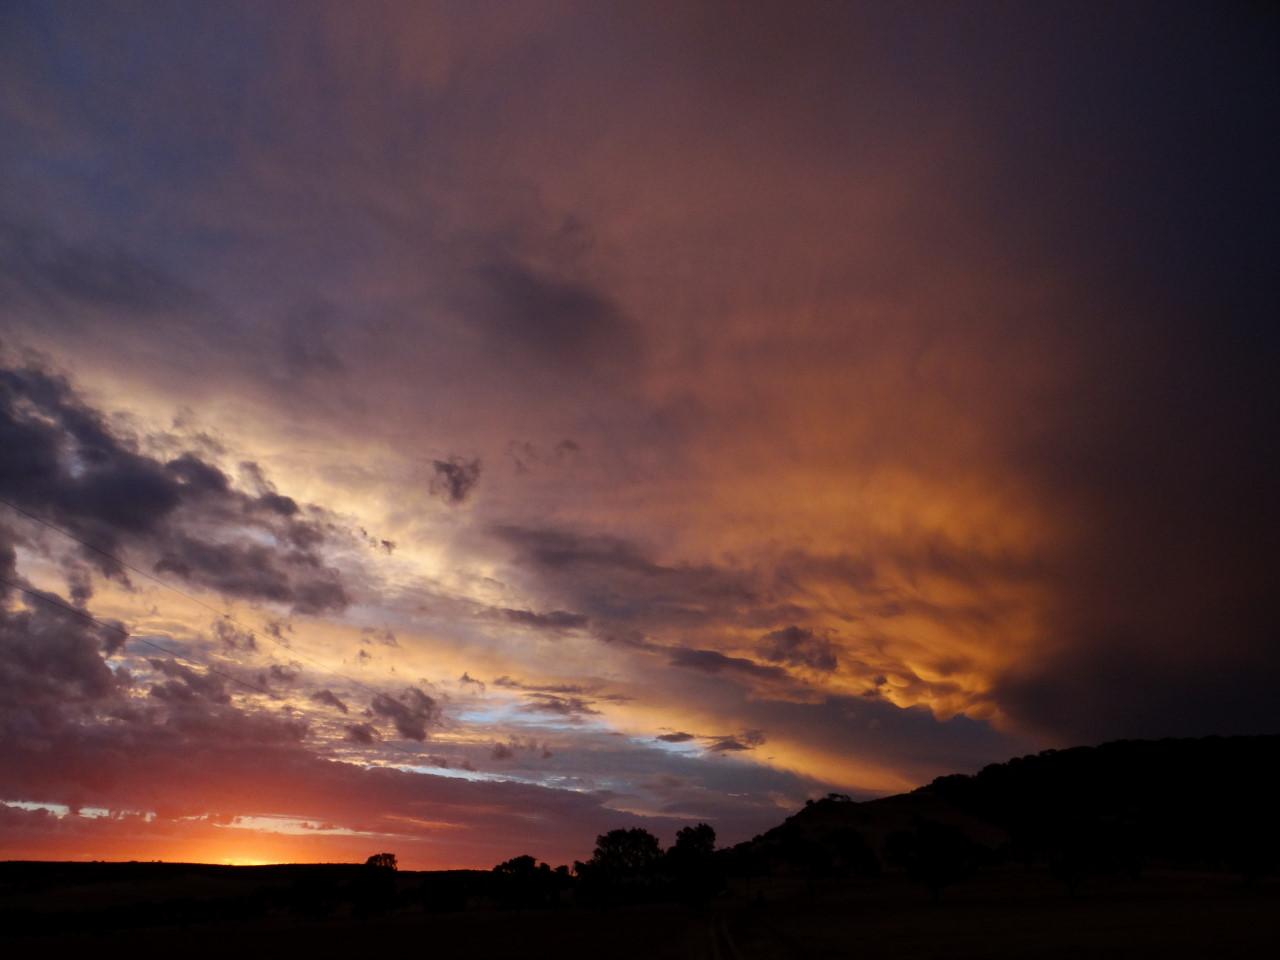 sunset spirit on the farm